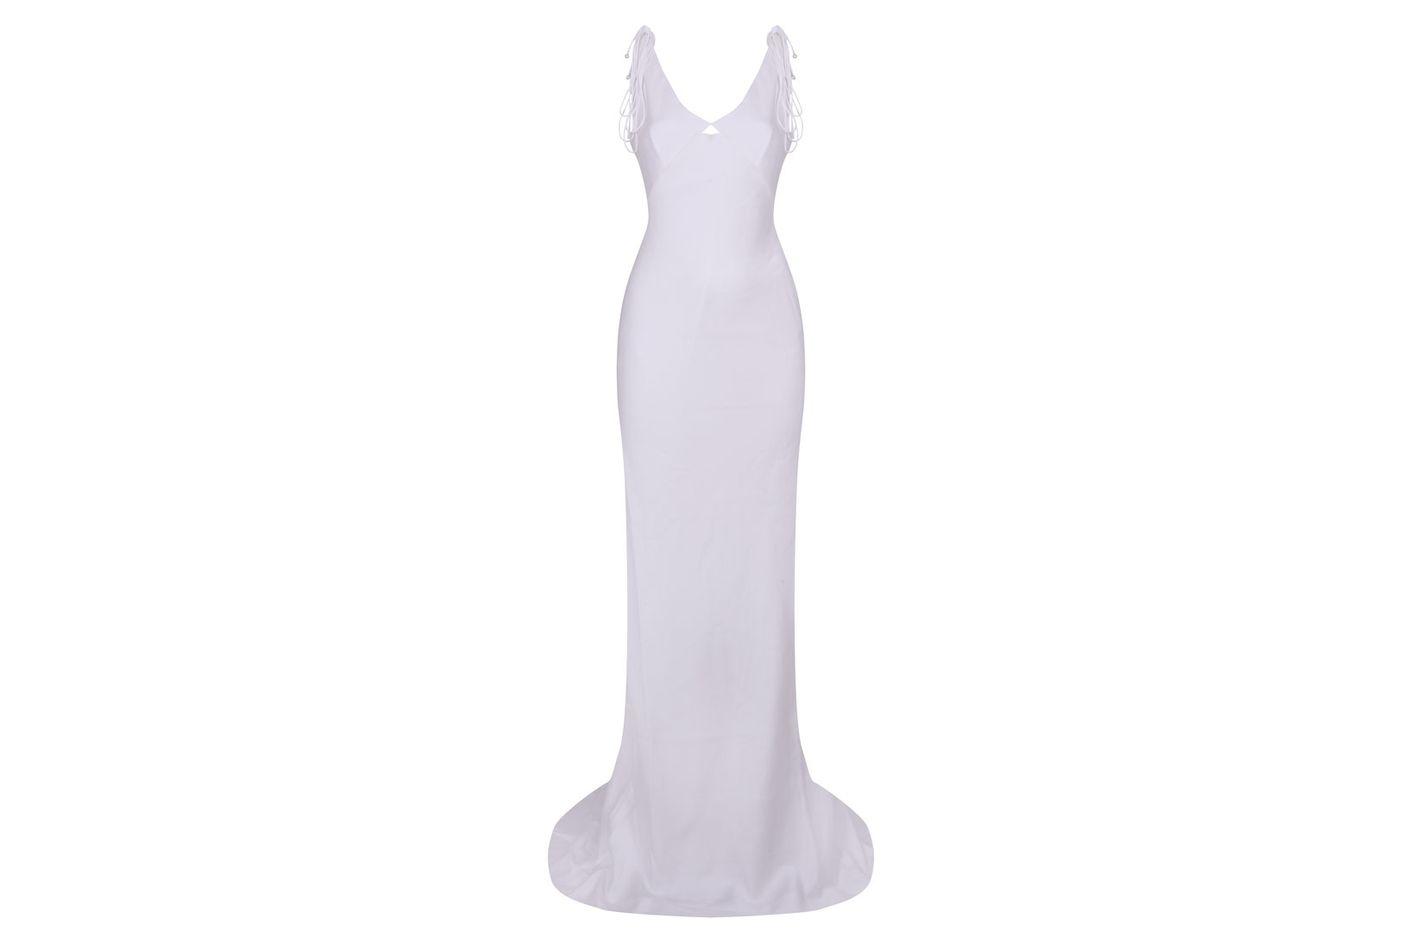 Satin Tie Shoulder Dress